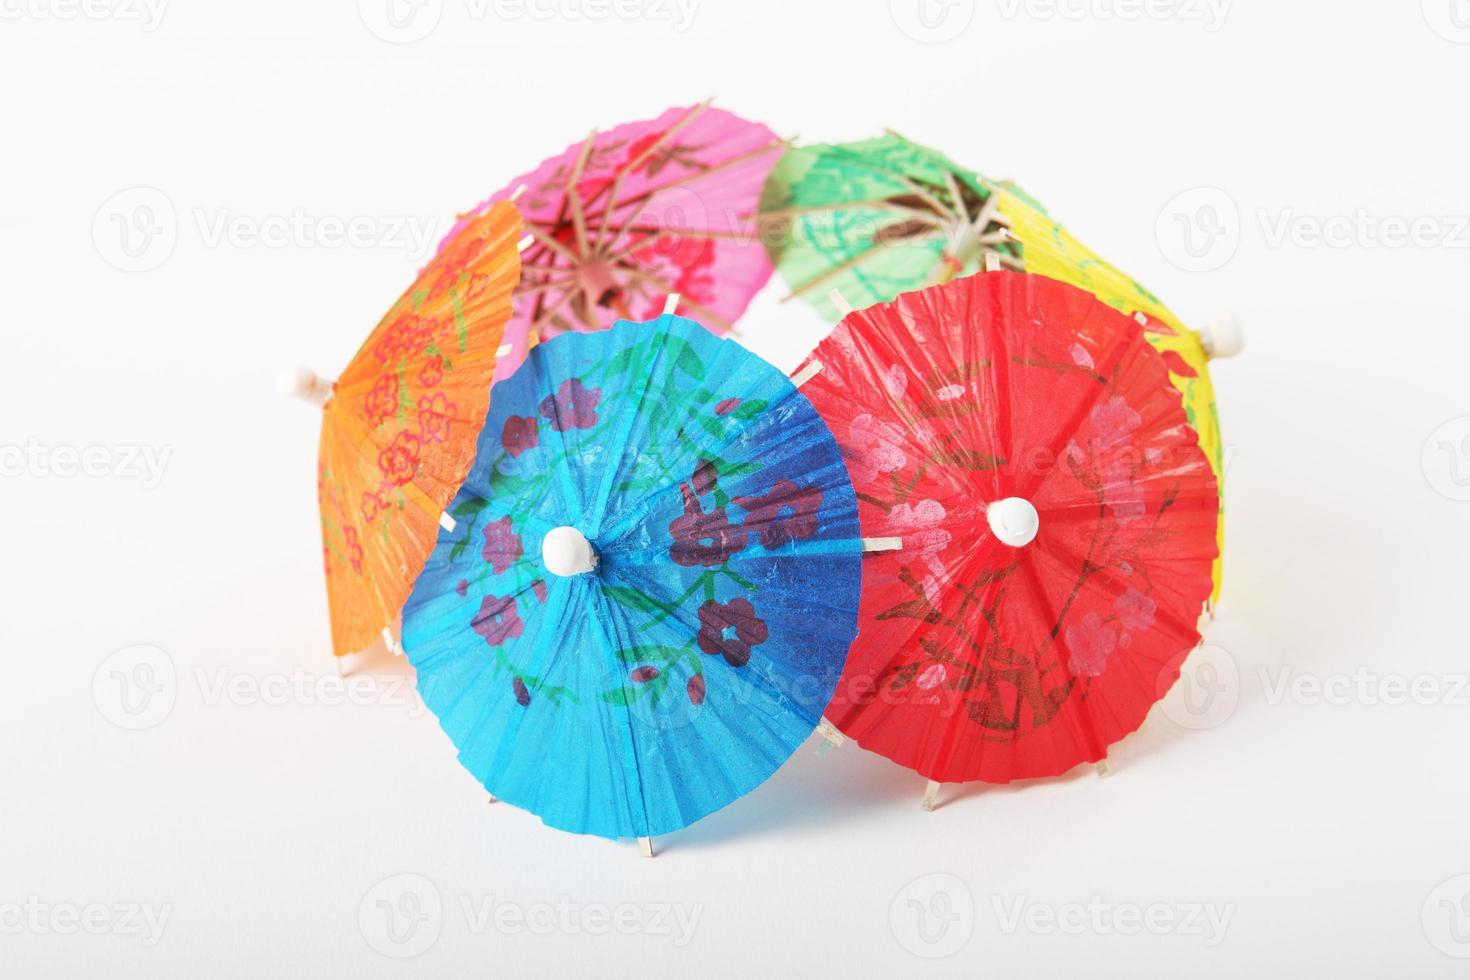 guarda-chuvas de papel cocktail foto